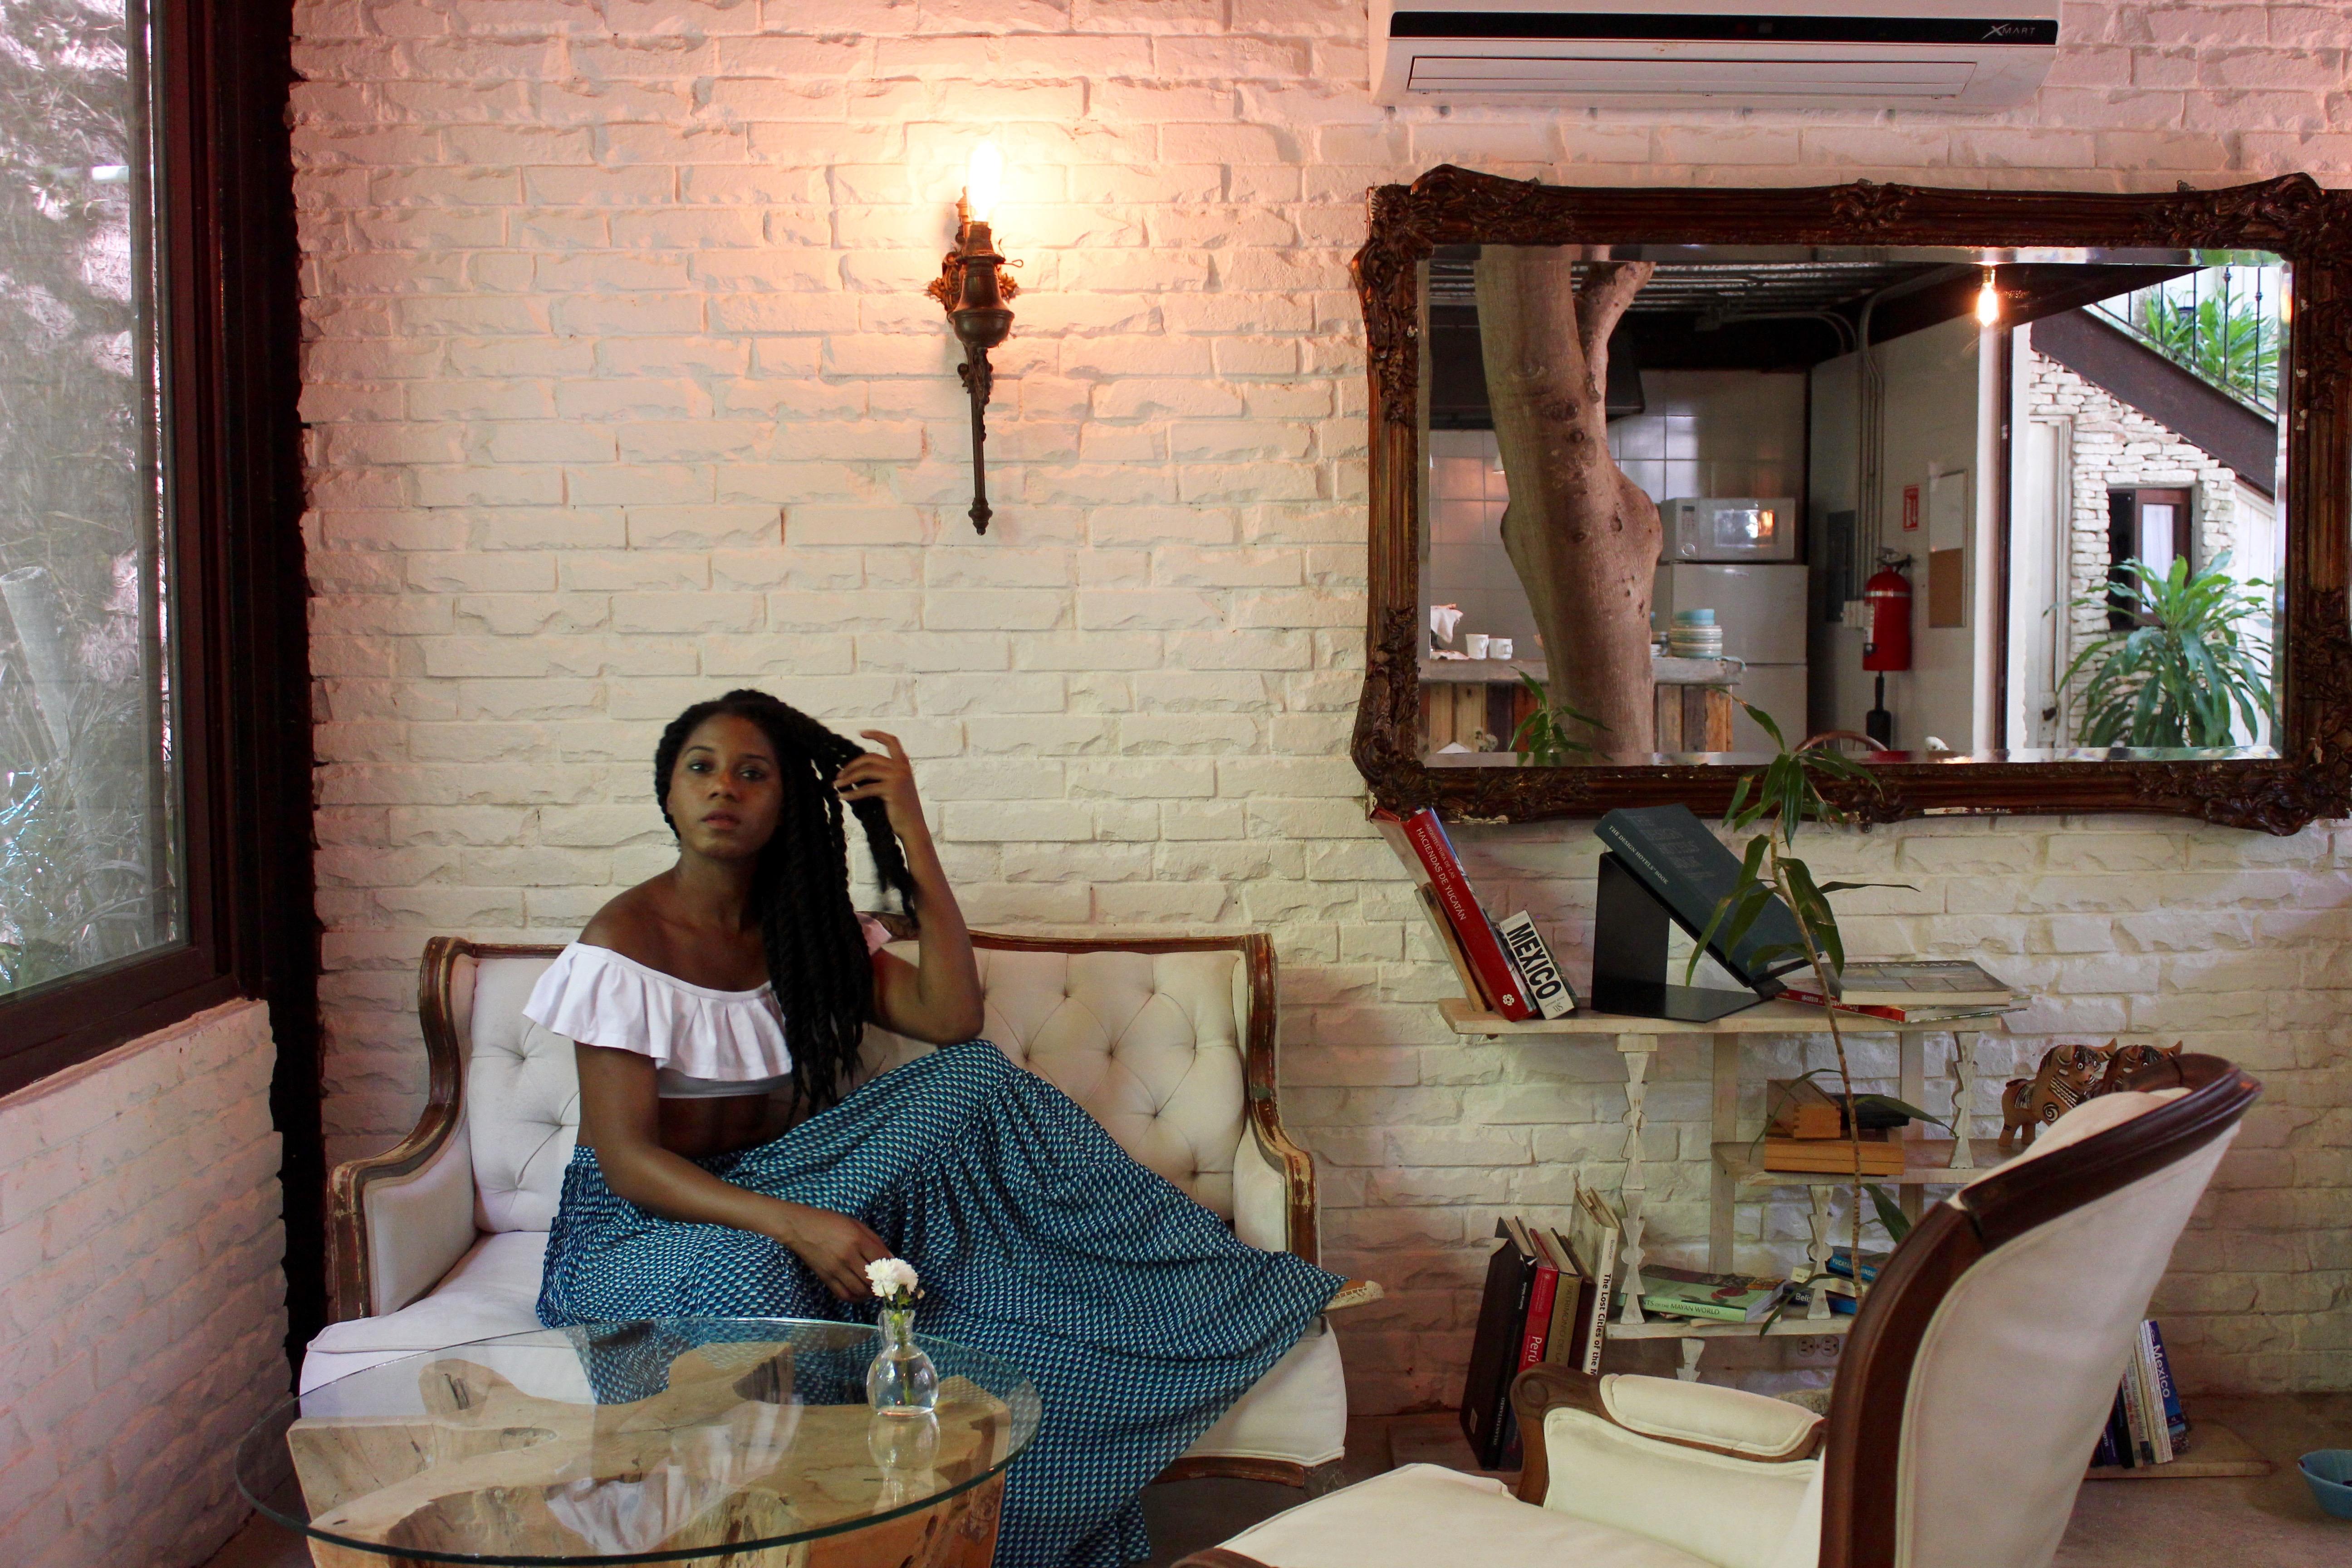 hotel la semilla fashion steele nyc. Black Bedroom Furniture Sets. Home Design Ideas